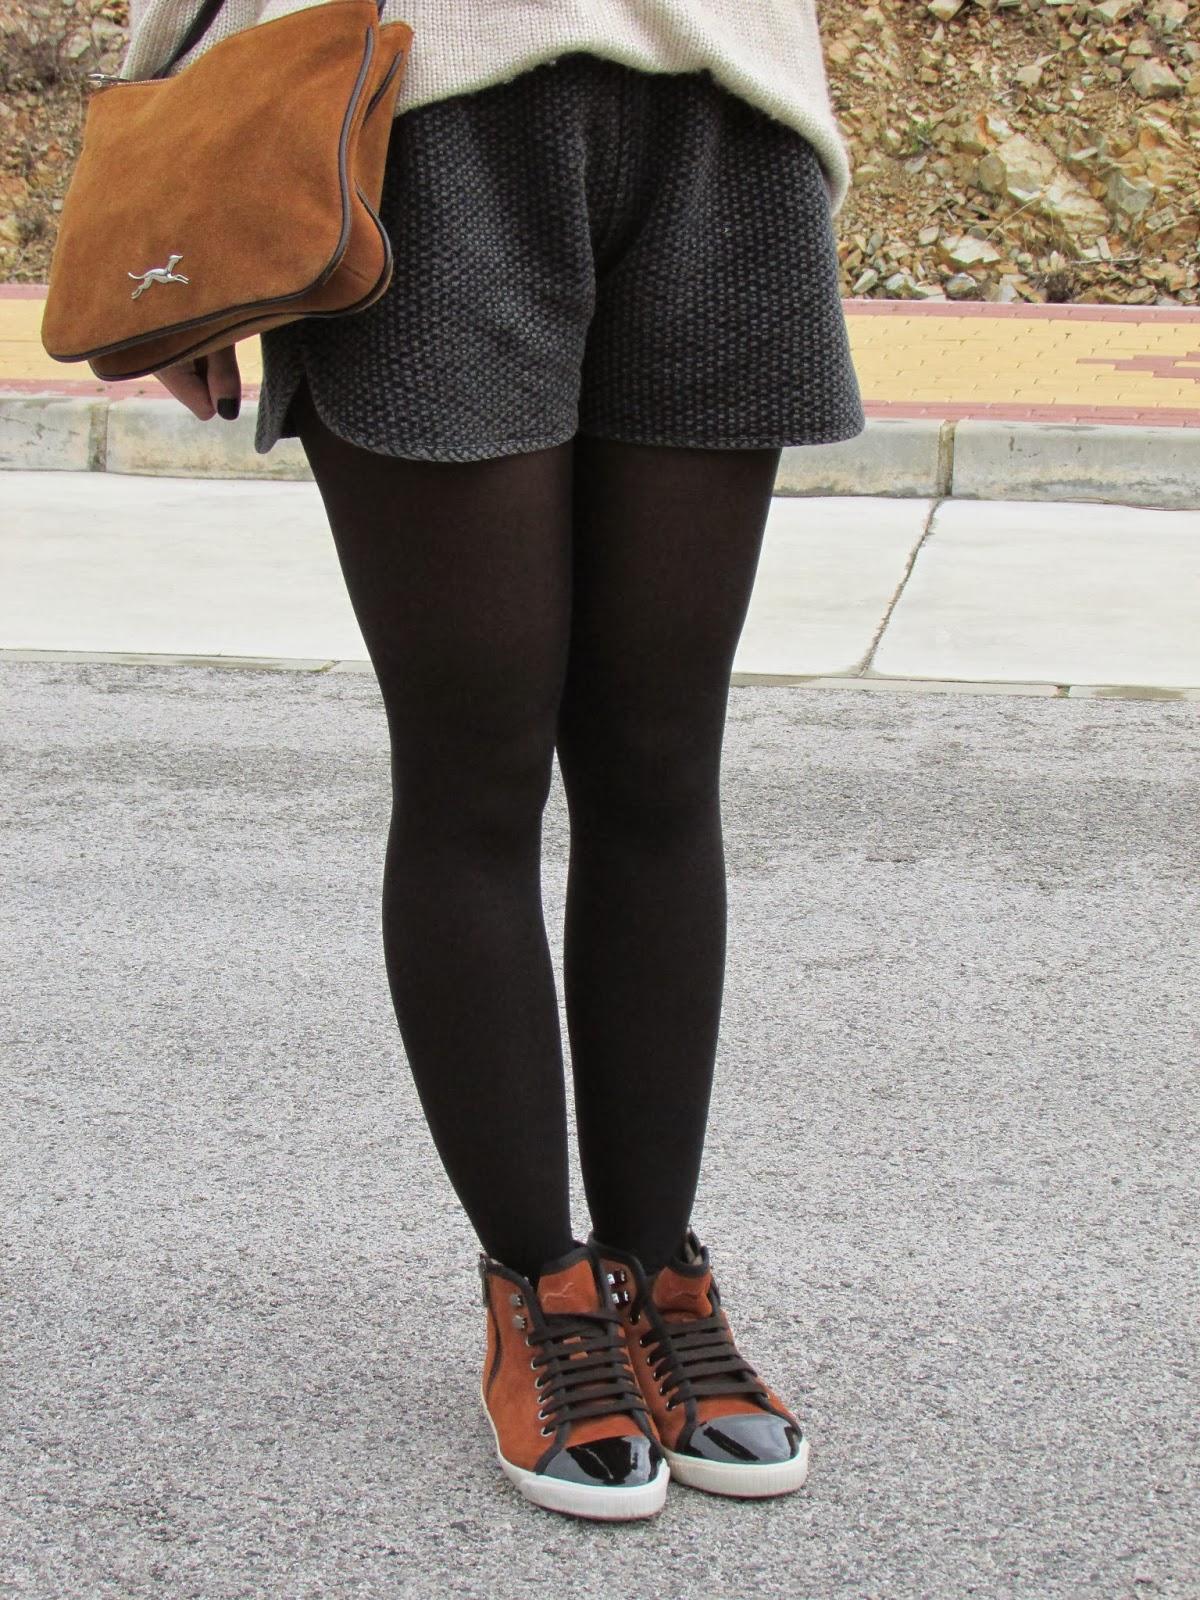 cristina style blogger malagueña fashion blogger malaga street style ootd outfit look inspiration zara mango tous lovely tendencias moda